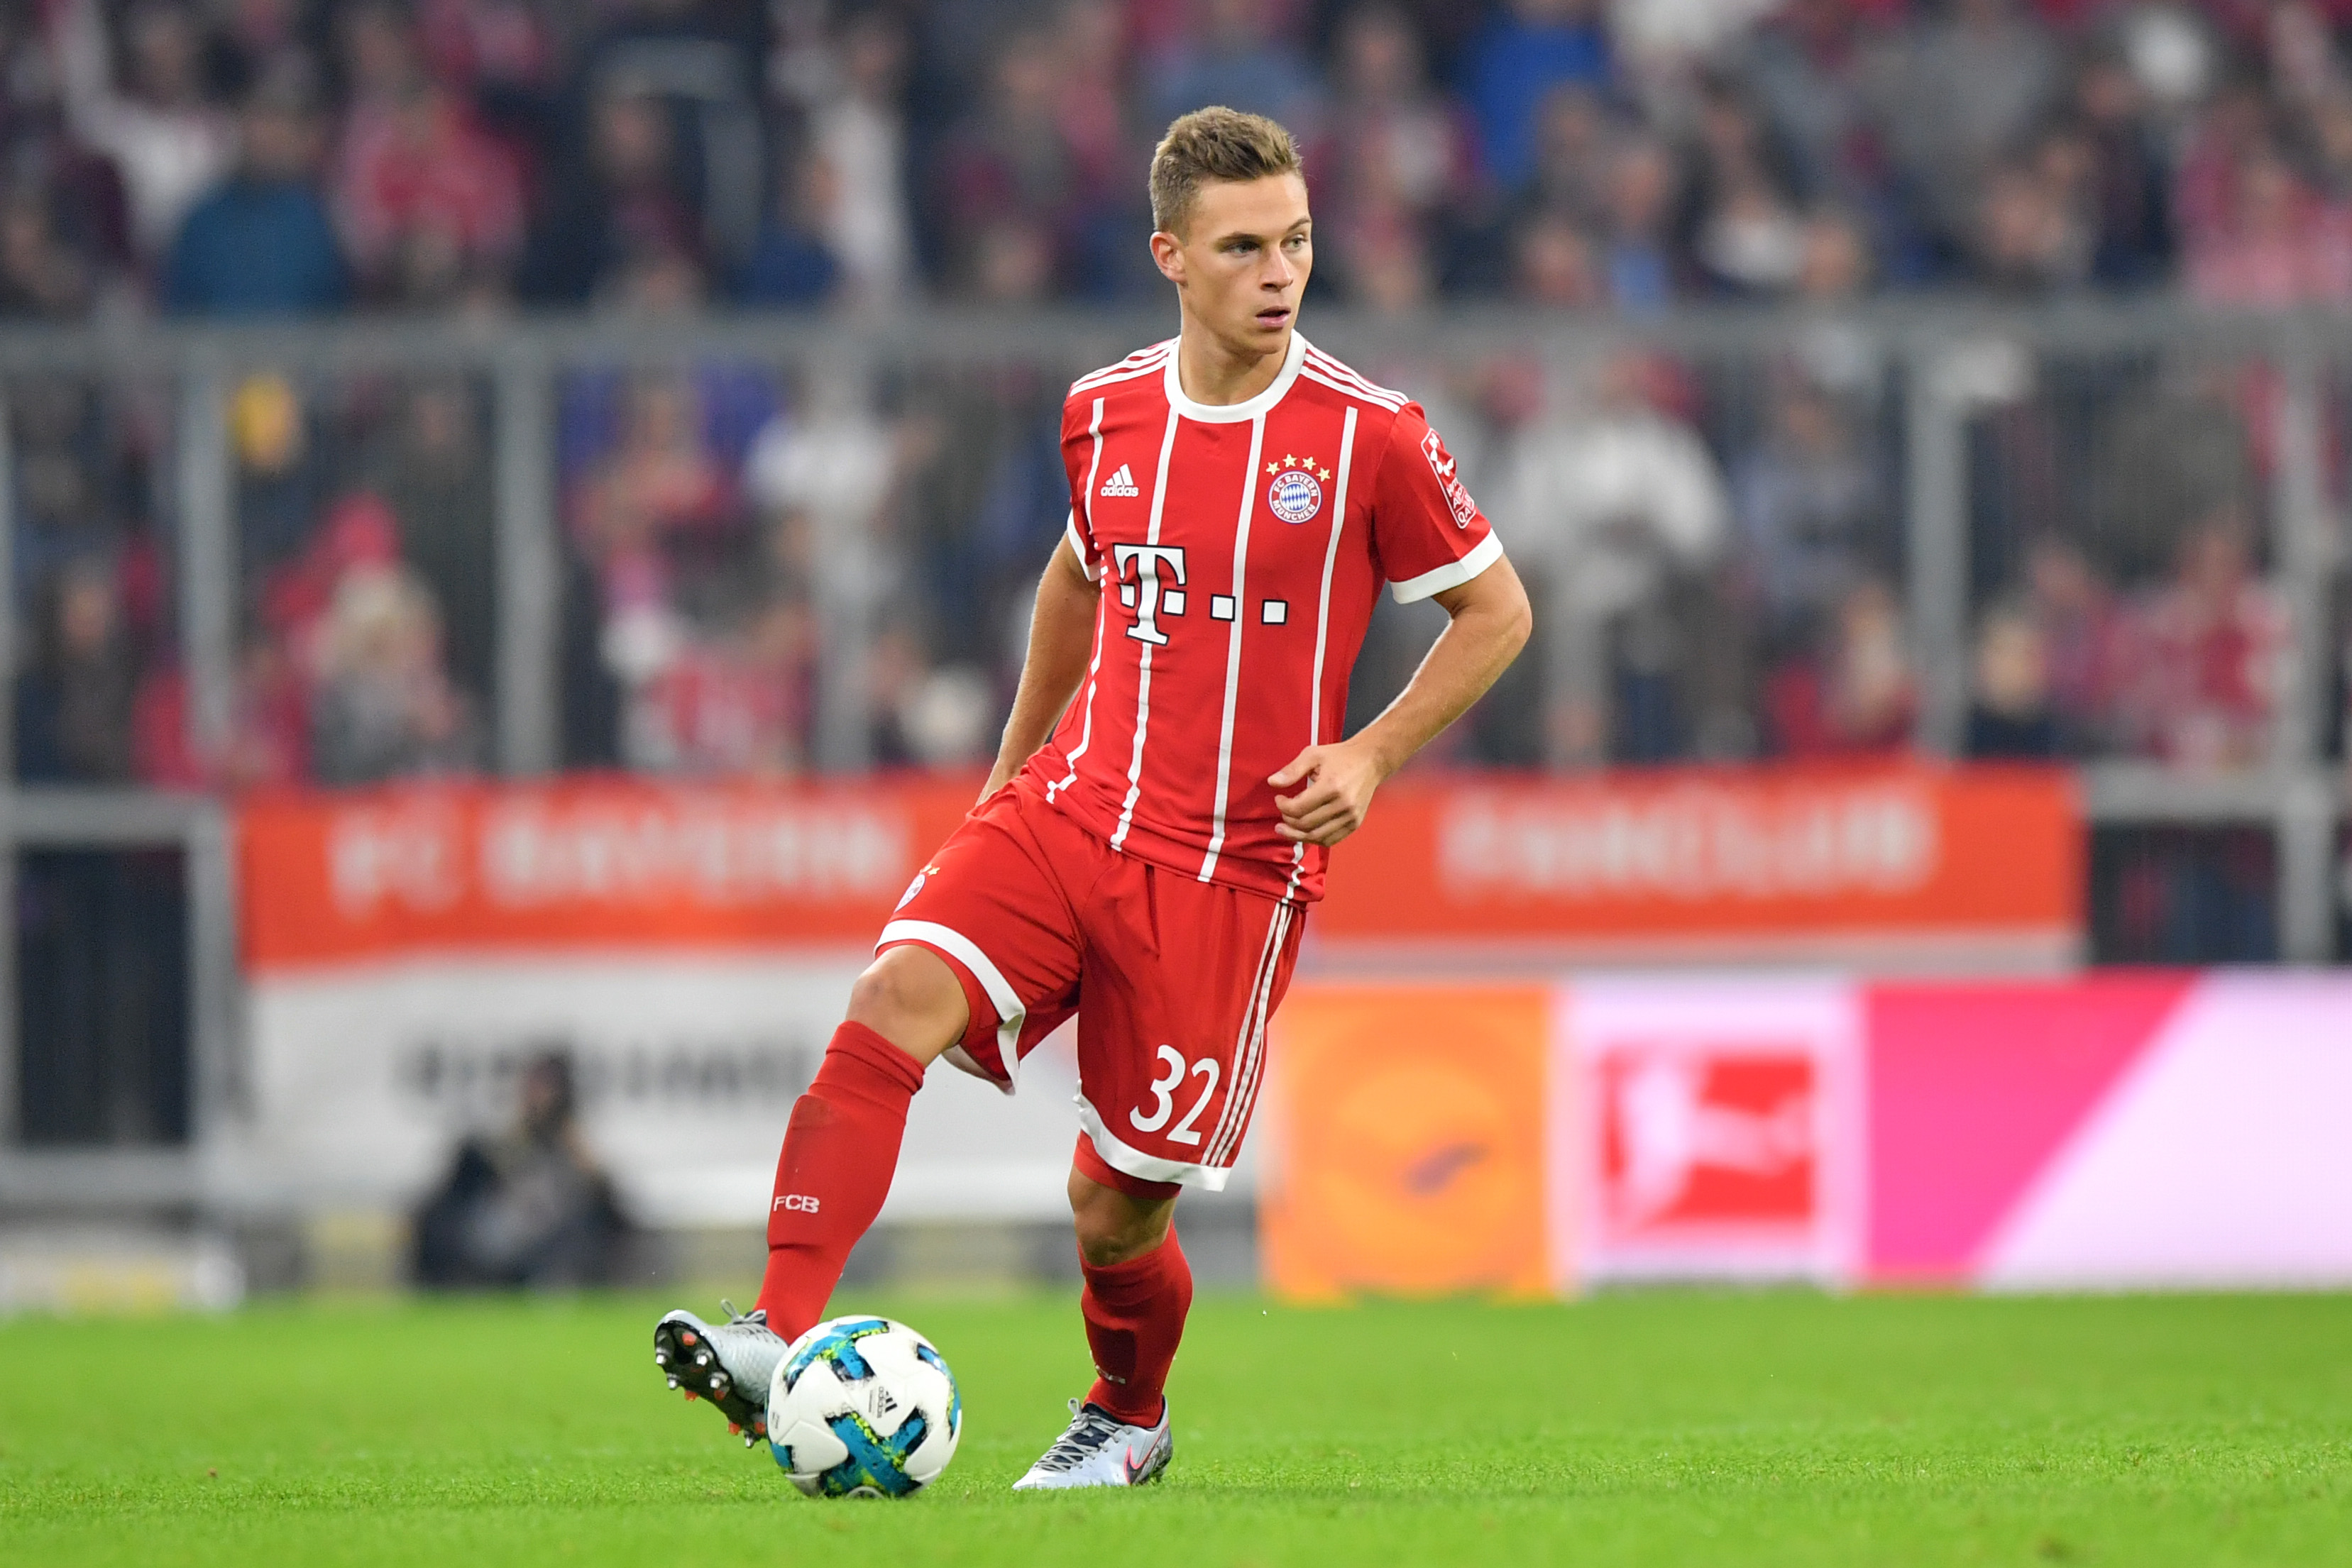 Bayern Munich vs PSG Four key battles to watch at the Parc des